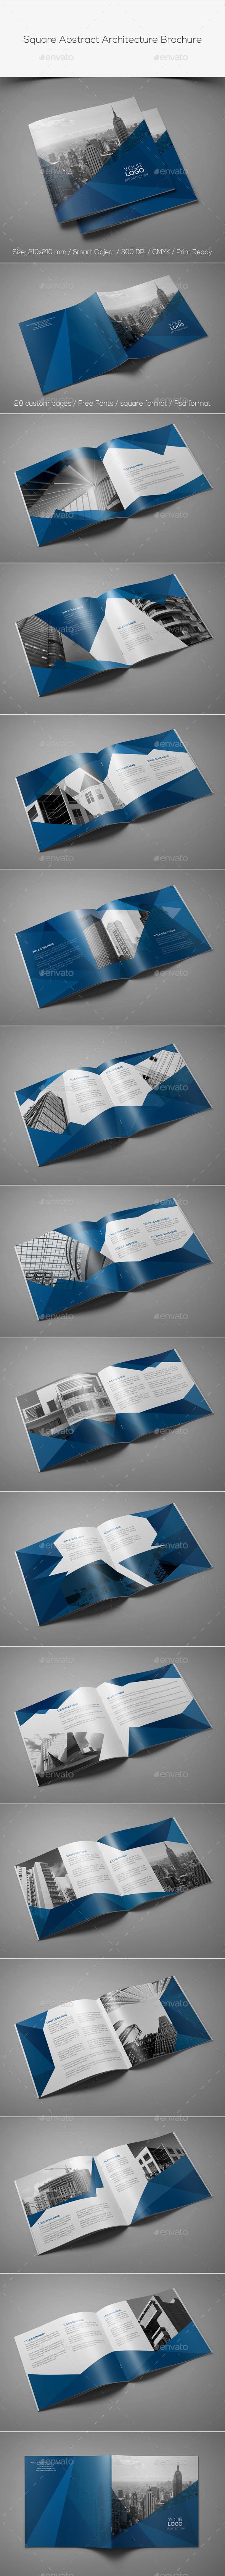 GraphicRiver Square Abstract Architecture Brochure 11252850